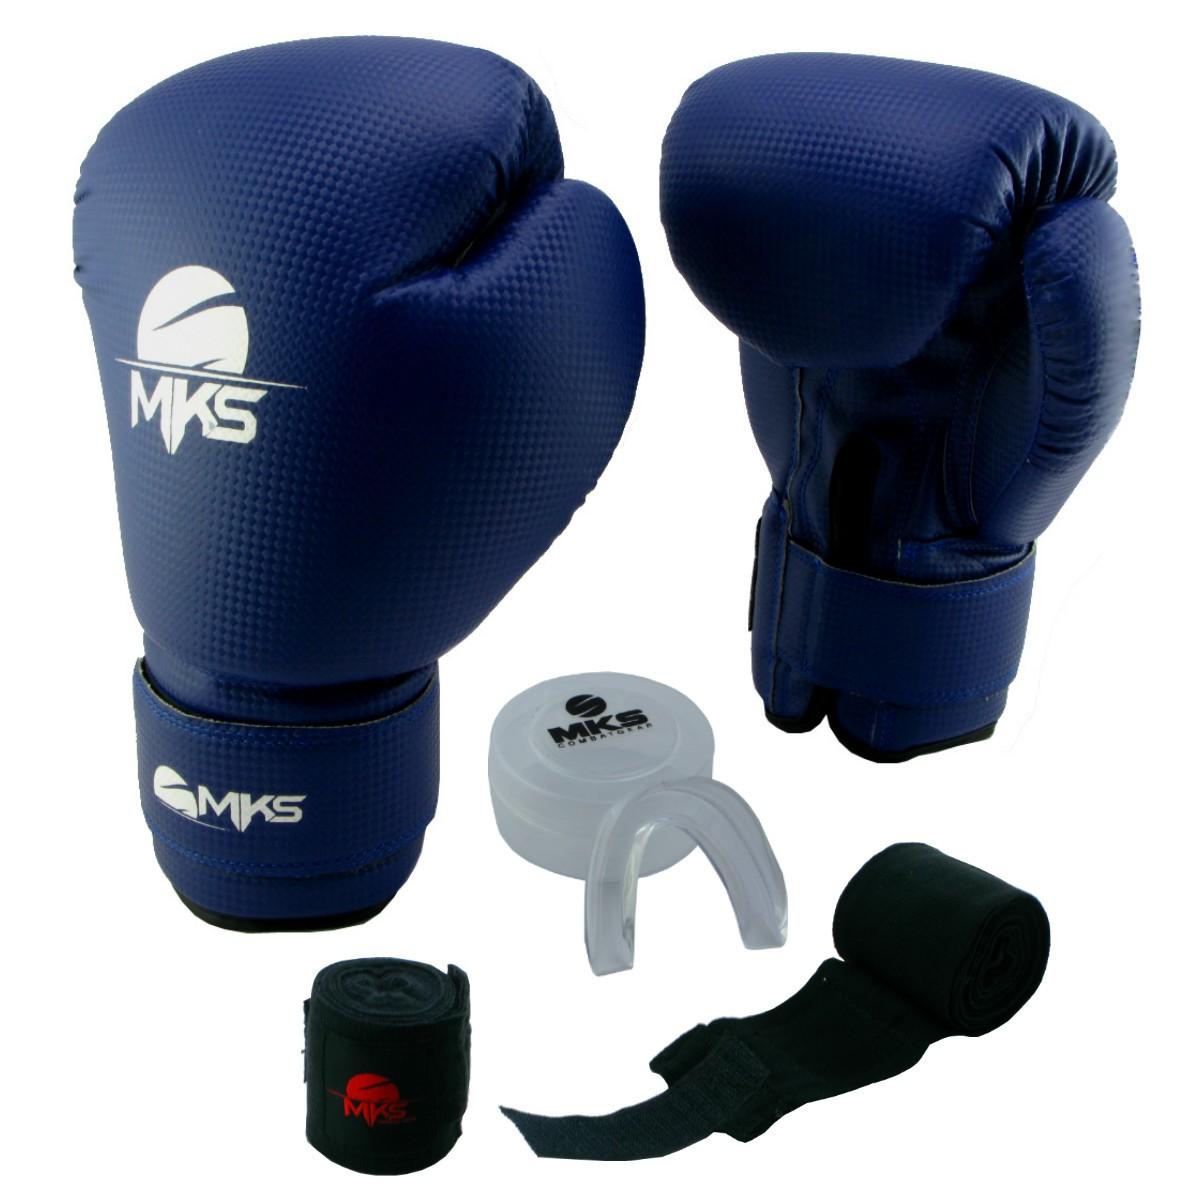 Luva de Boxe Prospect MKS Blue 14 oz + Protetor Bucal + Bandagem